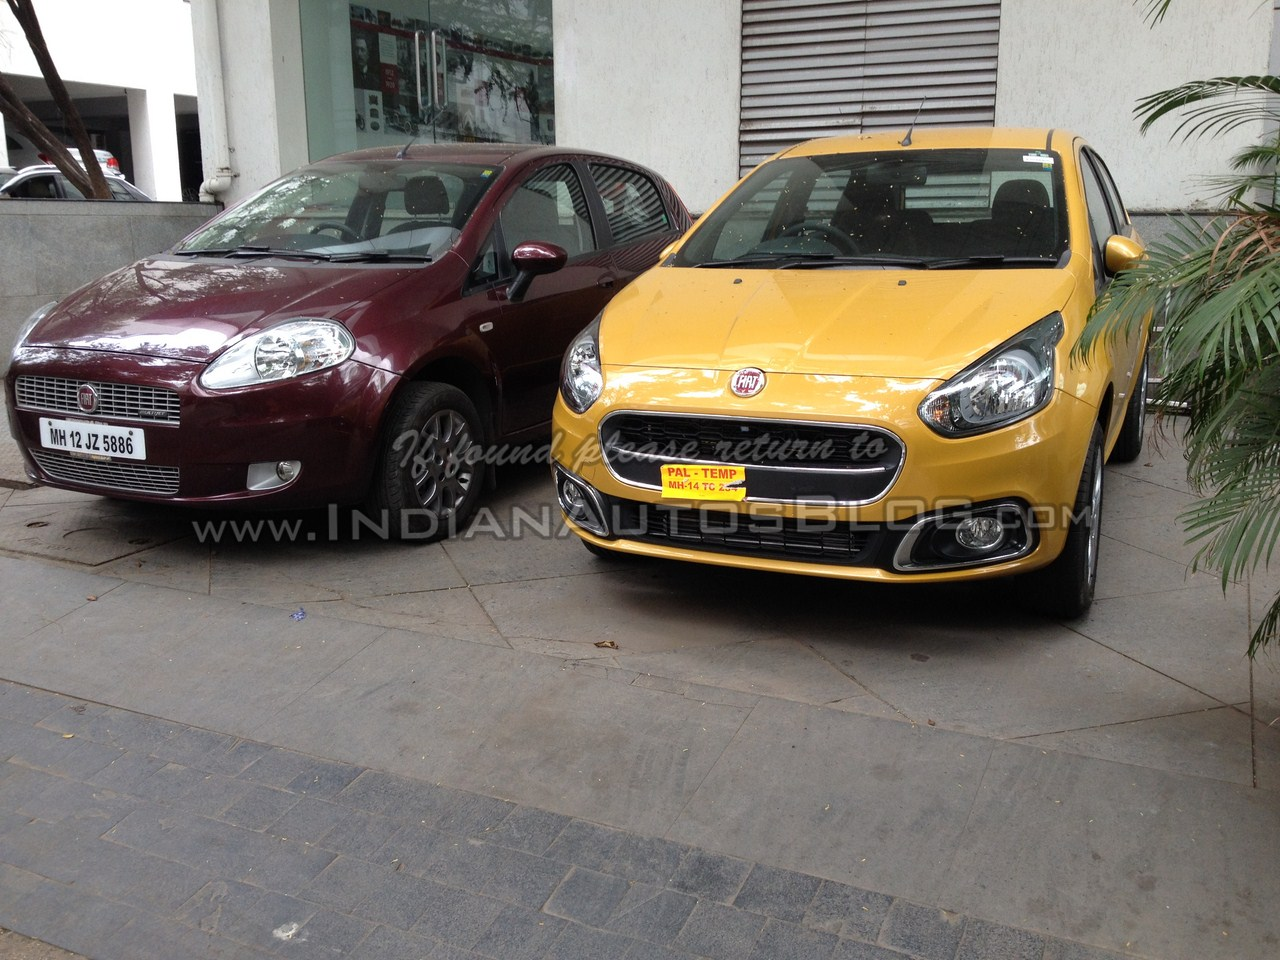 New Punto Evo vs Old Punto: Spotetd; Interiors & Rear AC Vents Revealed